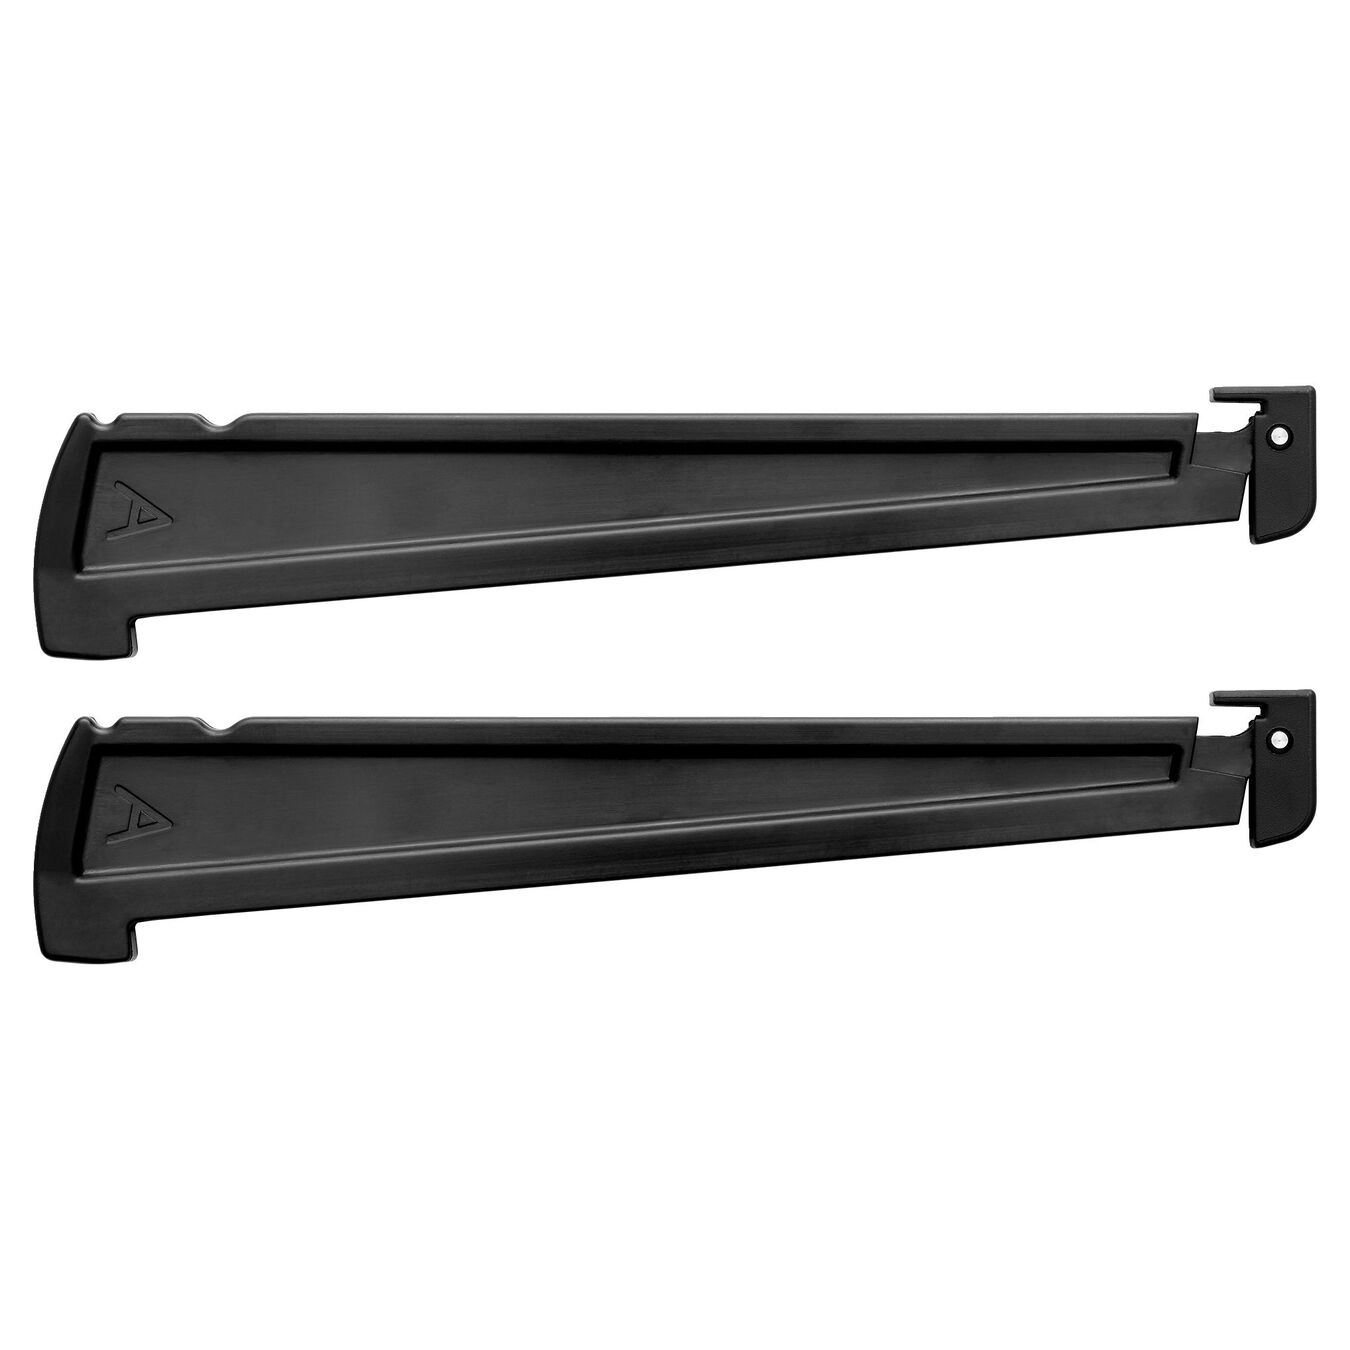 Affilacoltelli - 8 cm, ABS, nero,,large 3